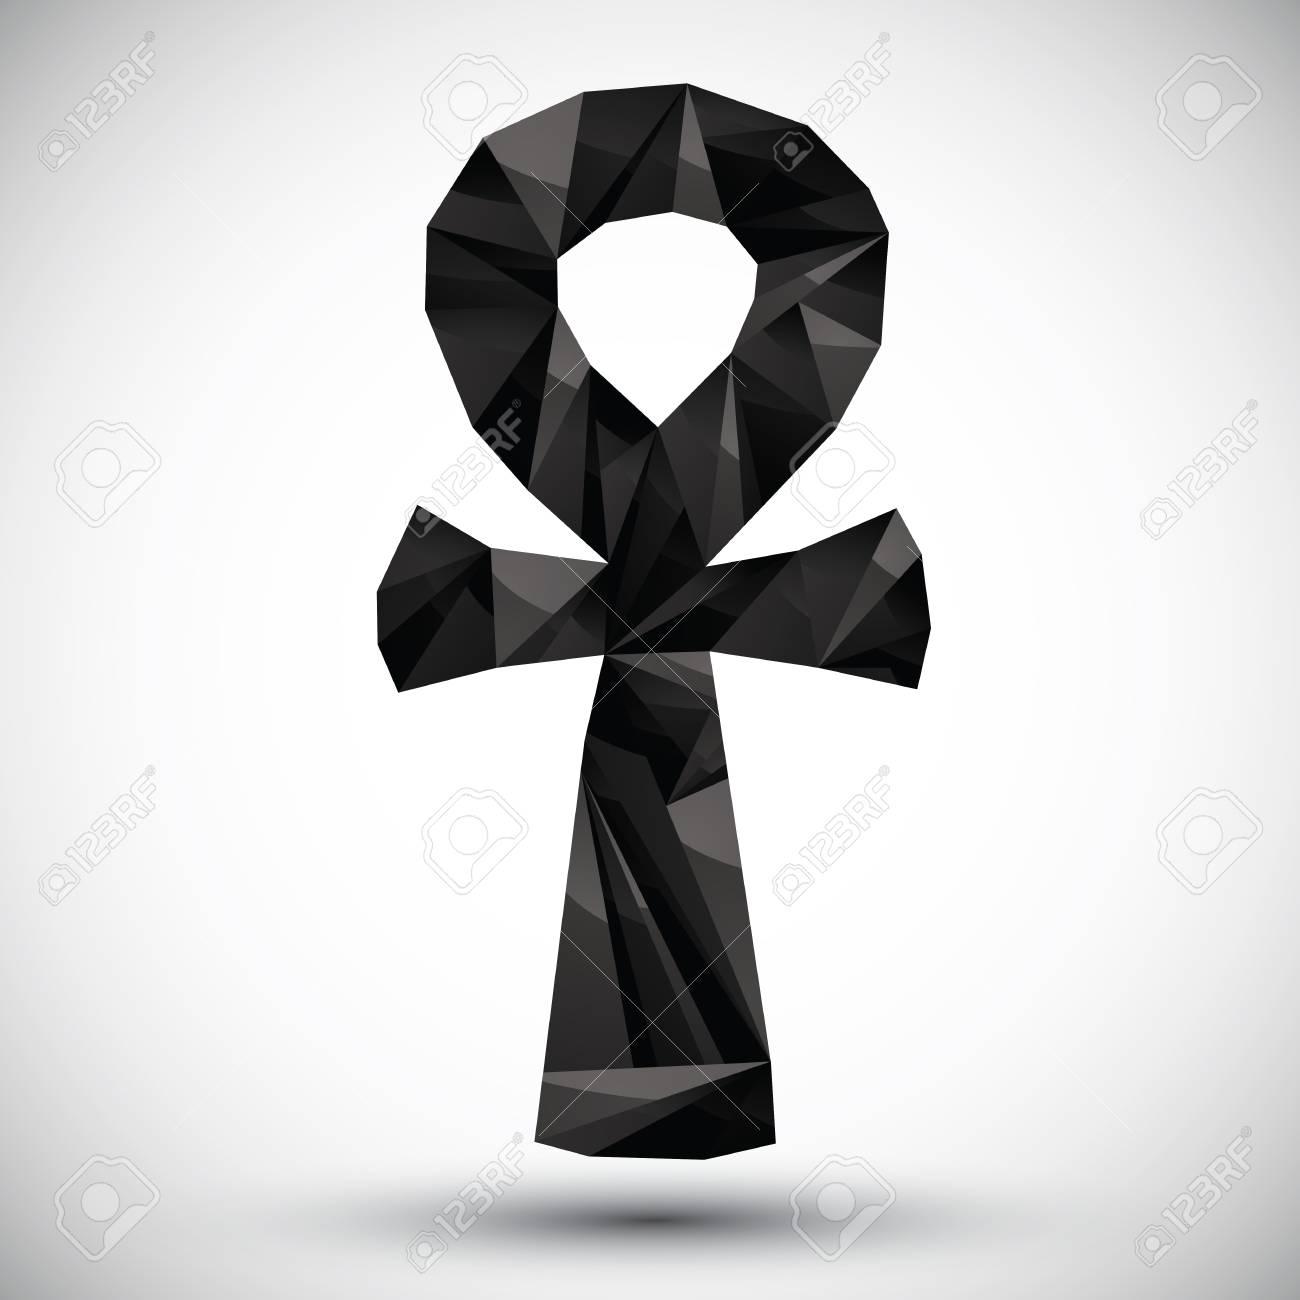 black ankh symbol egyptian word for life geometric icon made